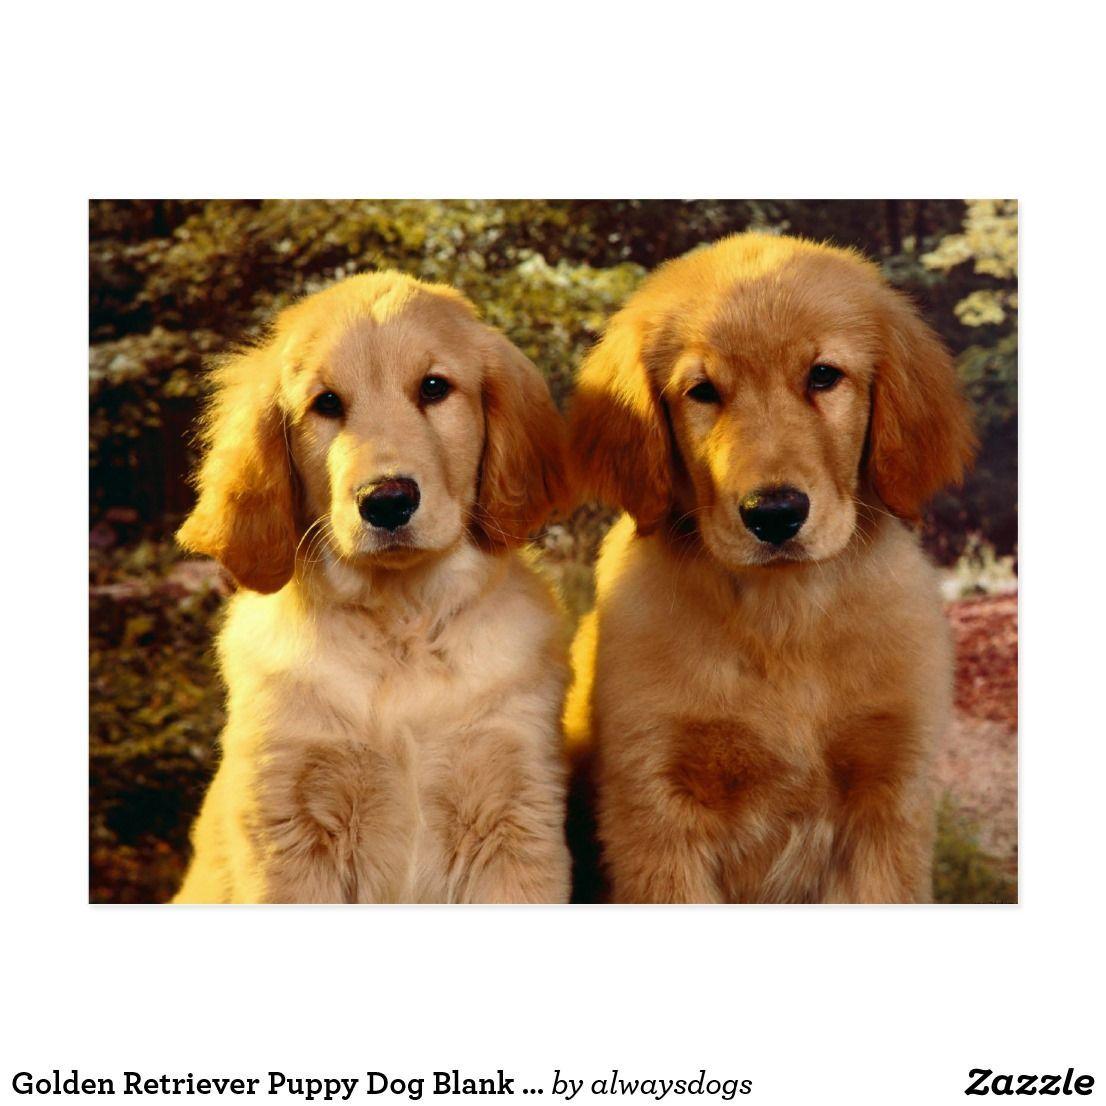 Golden Retriever Puppy Dog Blank Postcard Goldenretriever Dogs